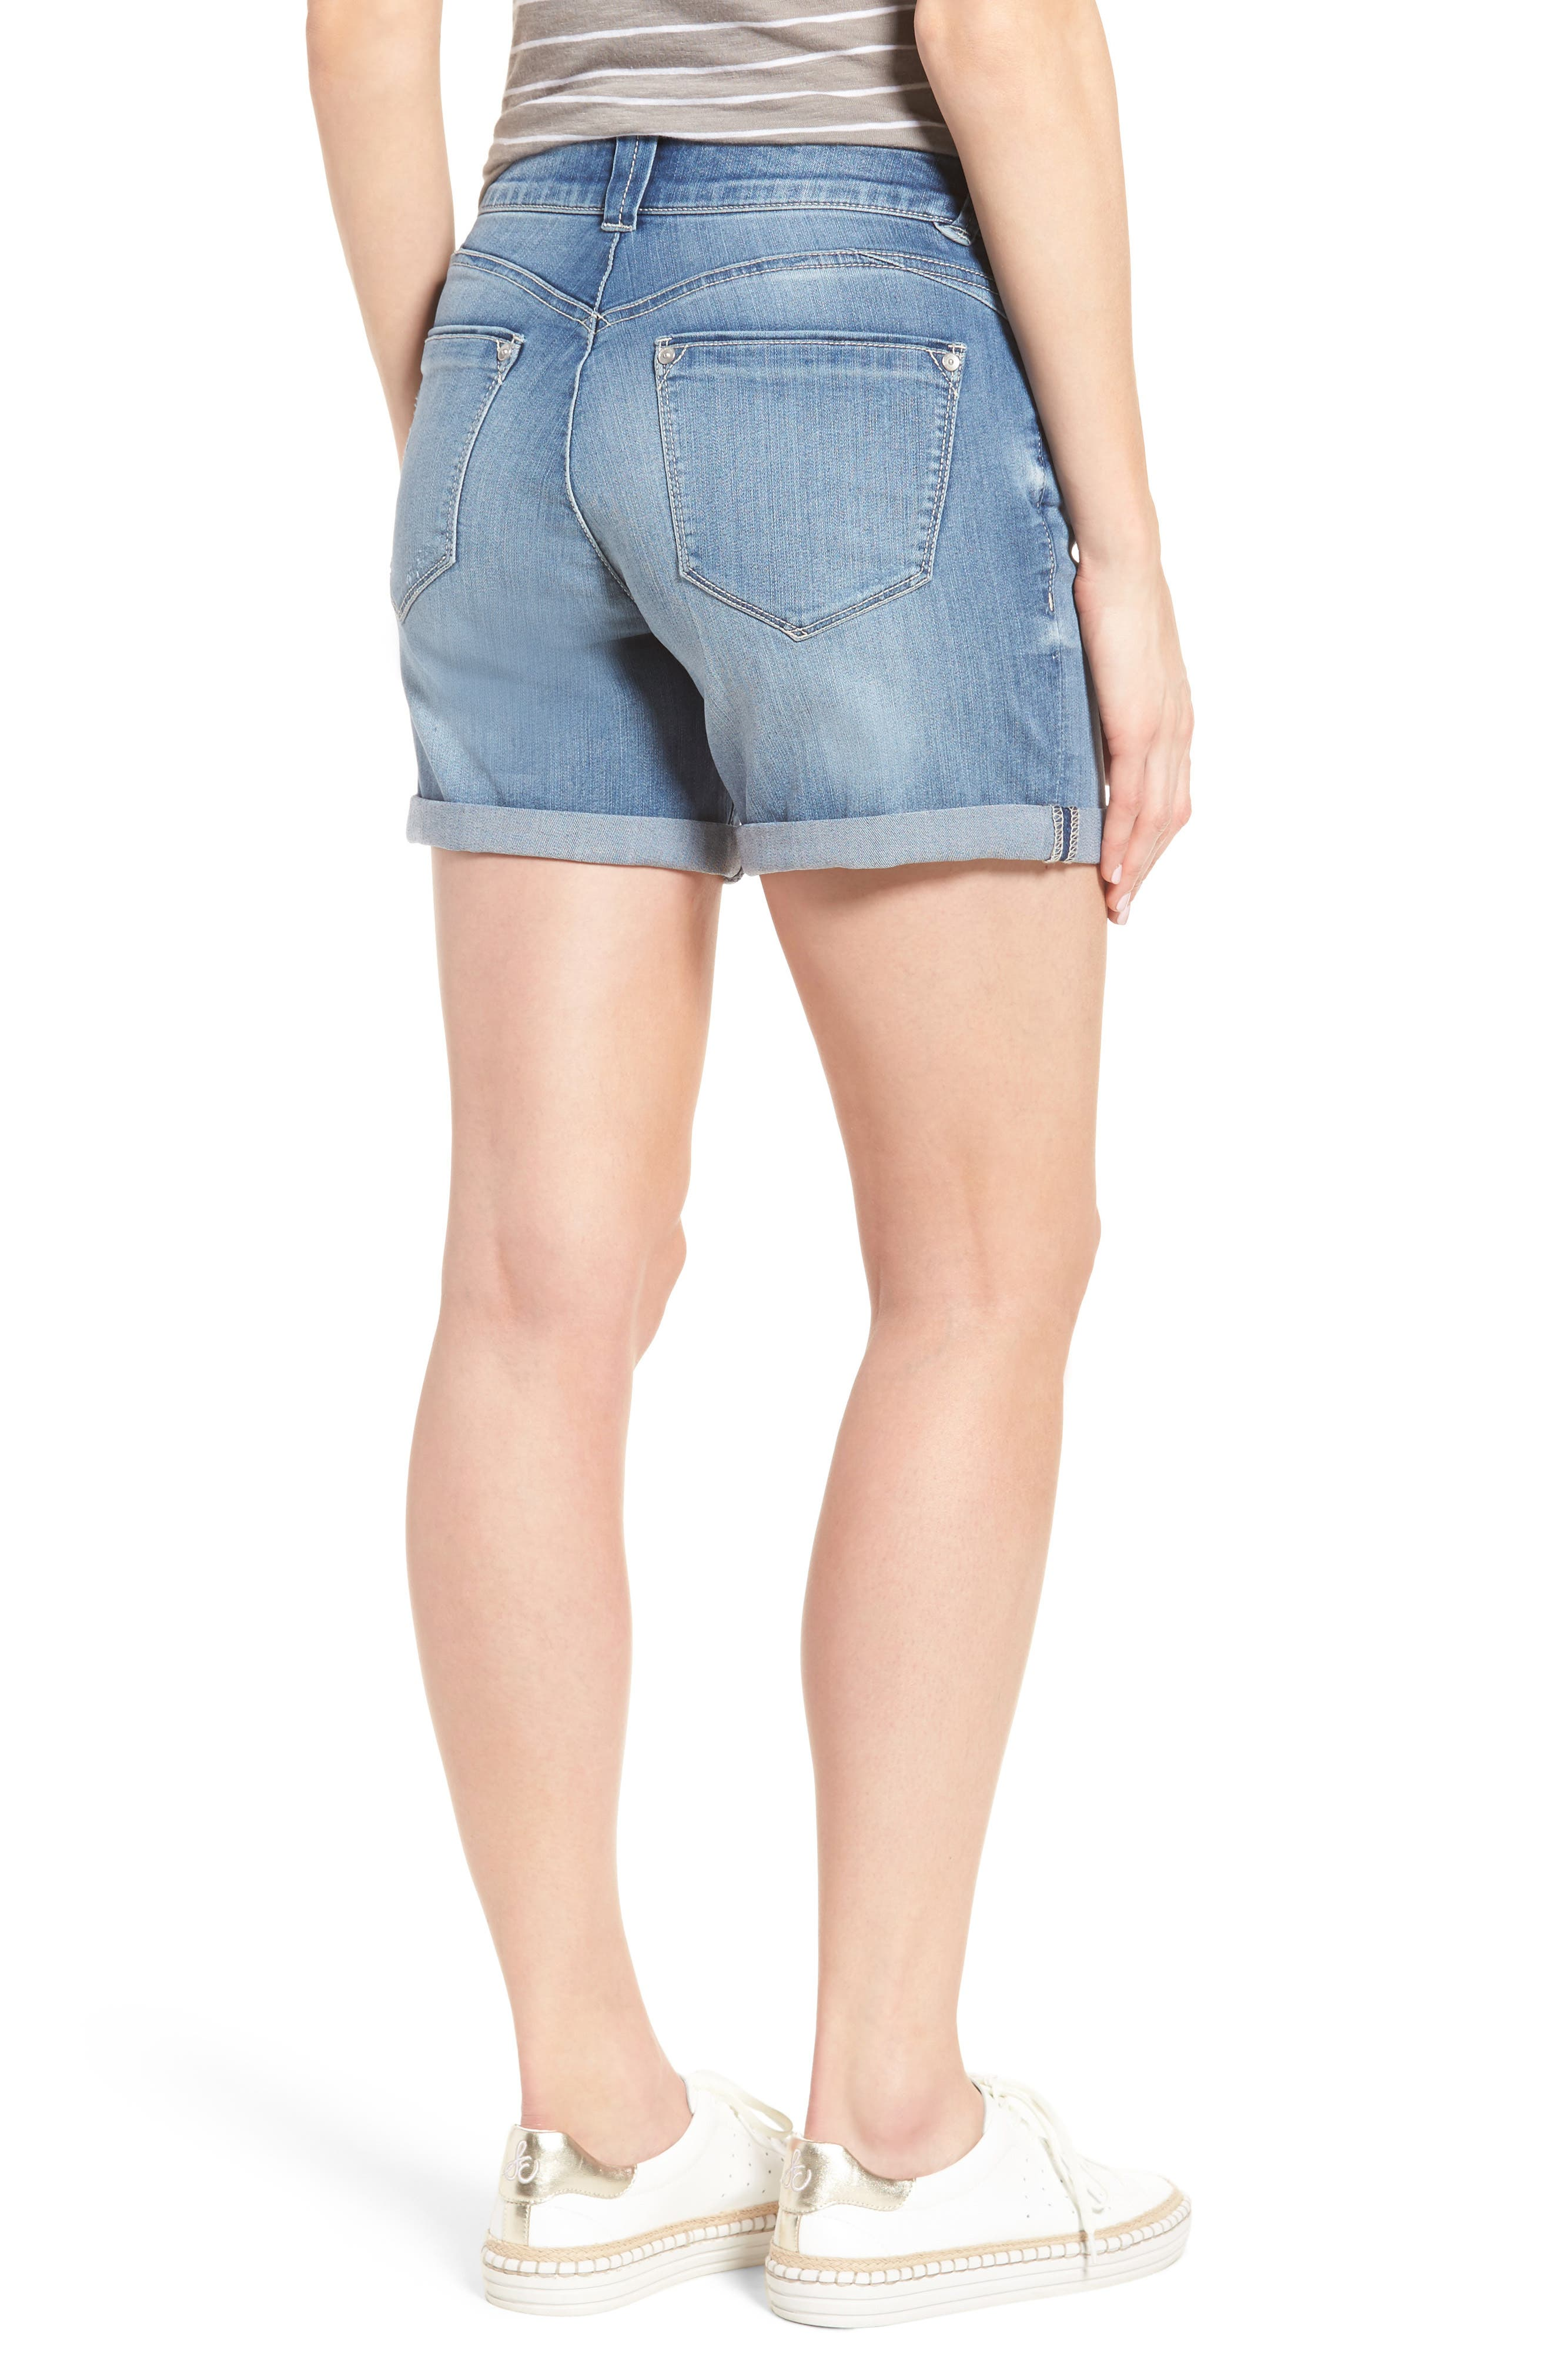 Alternate Image 2  - Wit & Wisdom Ab-solution Cuffed Denim Shorts (Regular & Petite) (Nordstrom Exclusive)